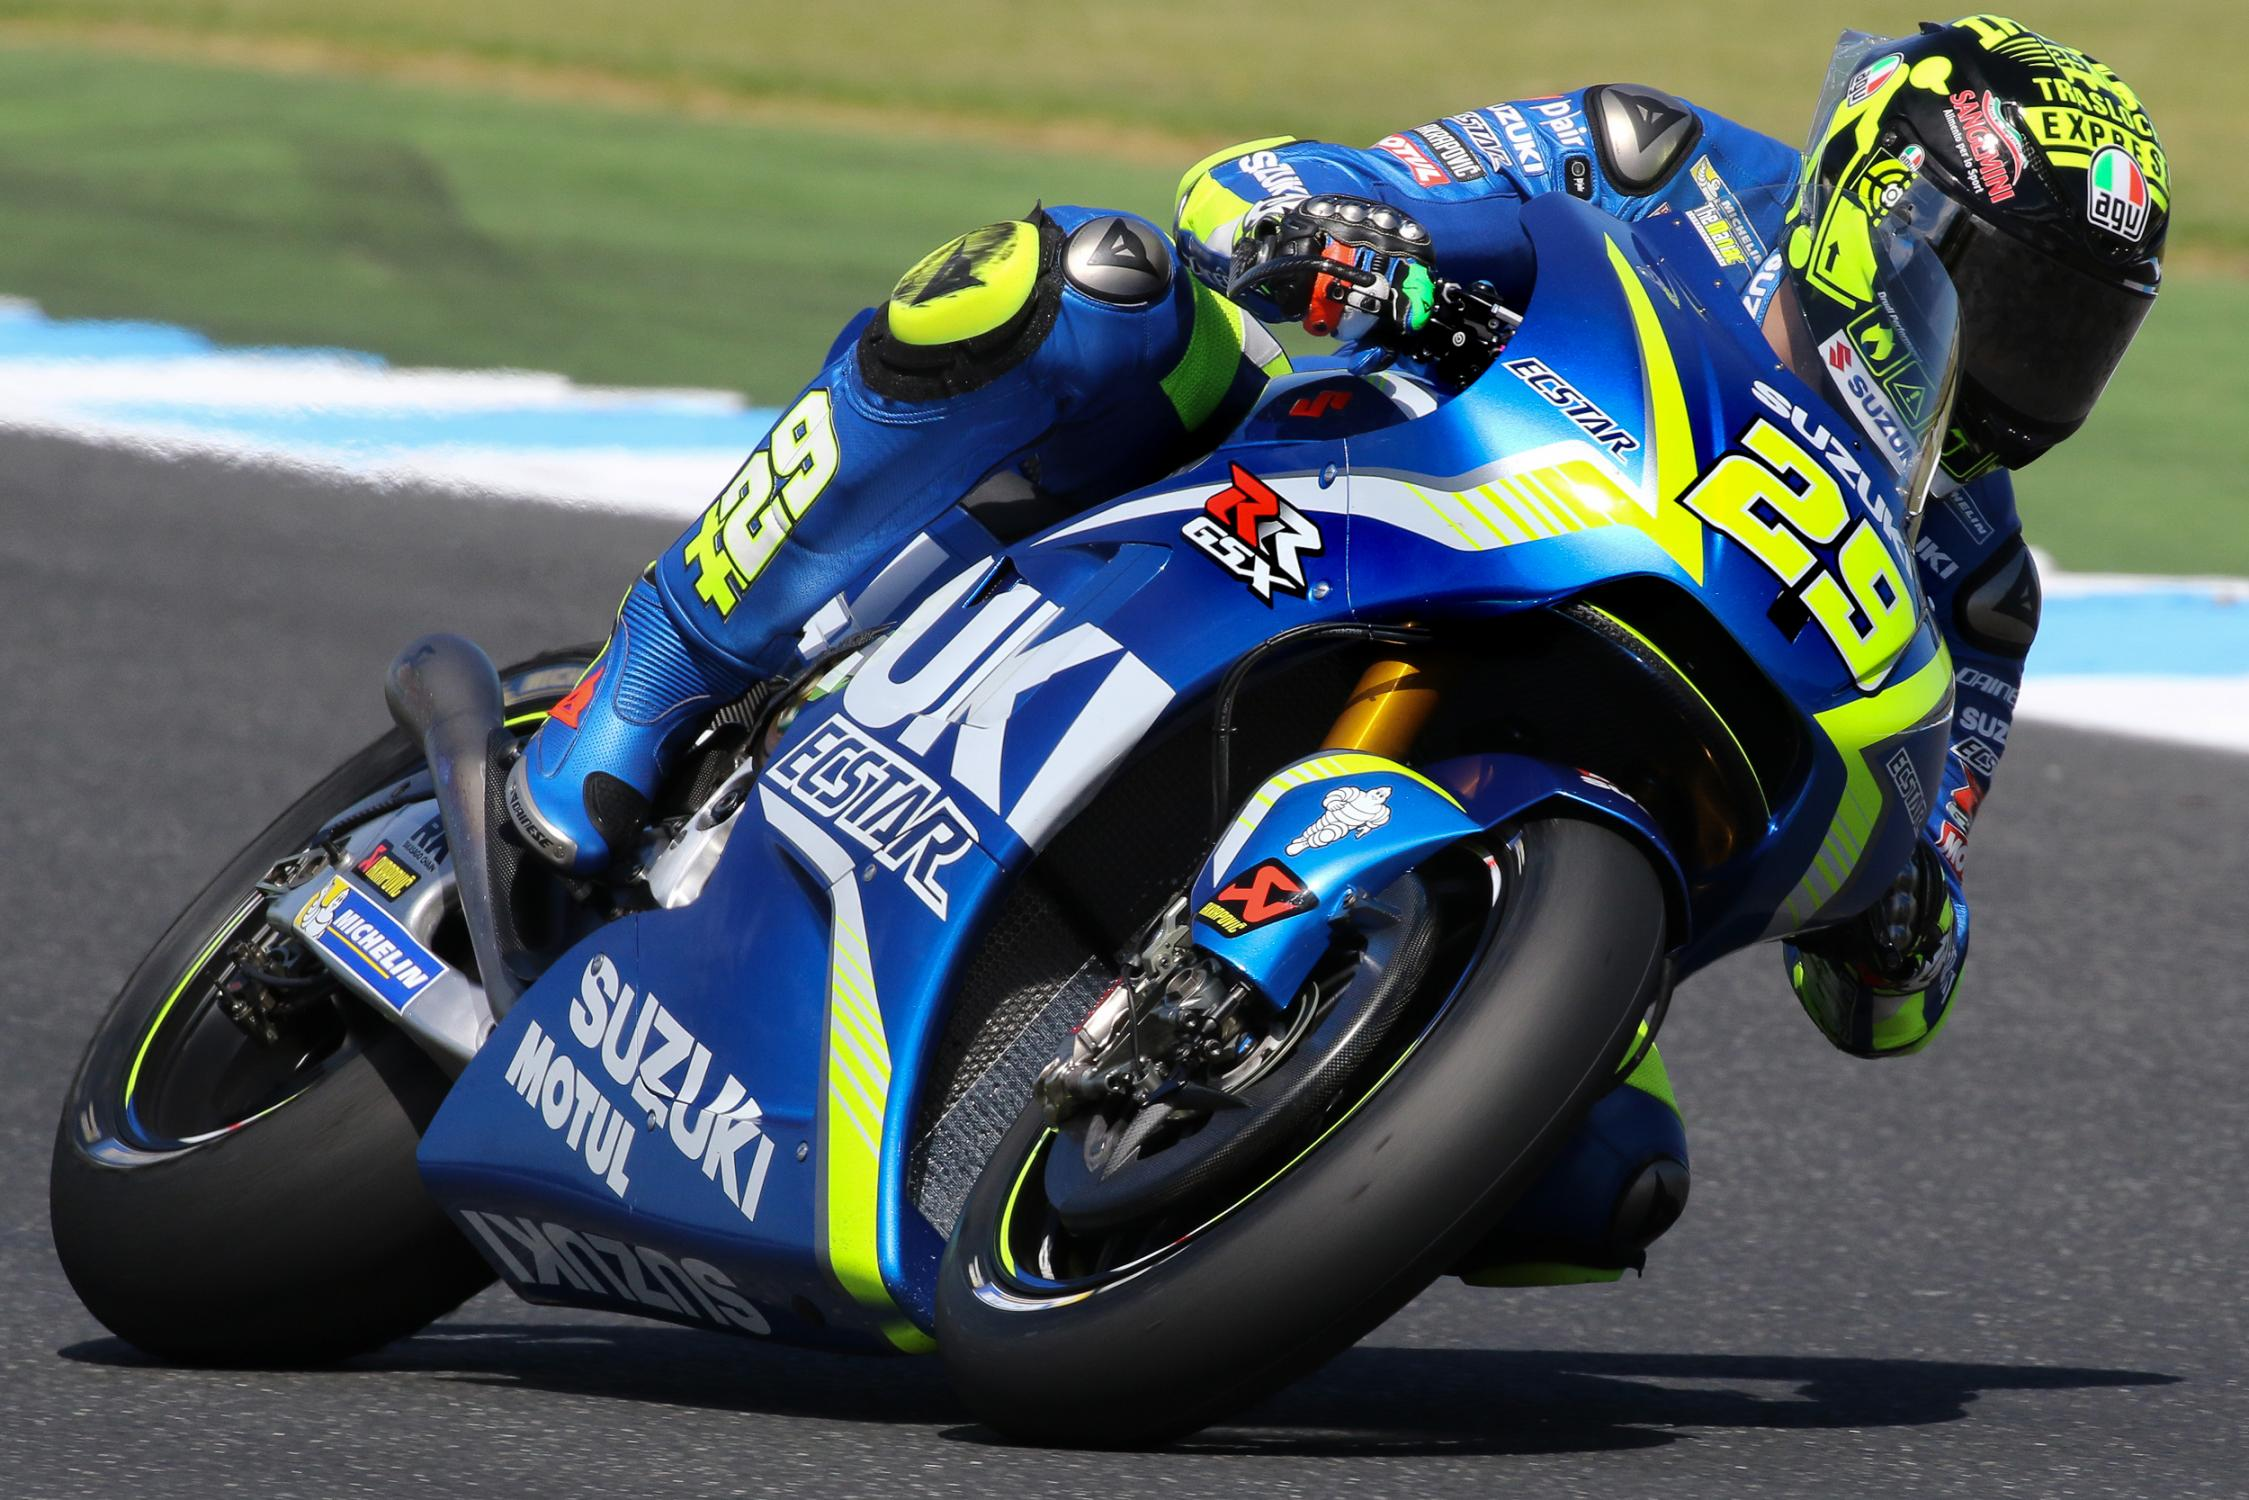 [MotoGP] Test Phillip Island 29-andrea-iannone-ita1p6a0701.gallery_full_top_fullscreen